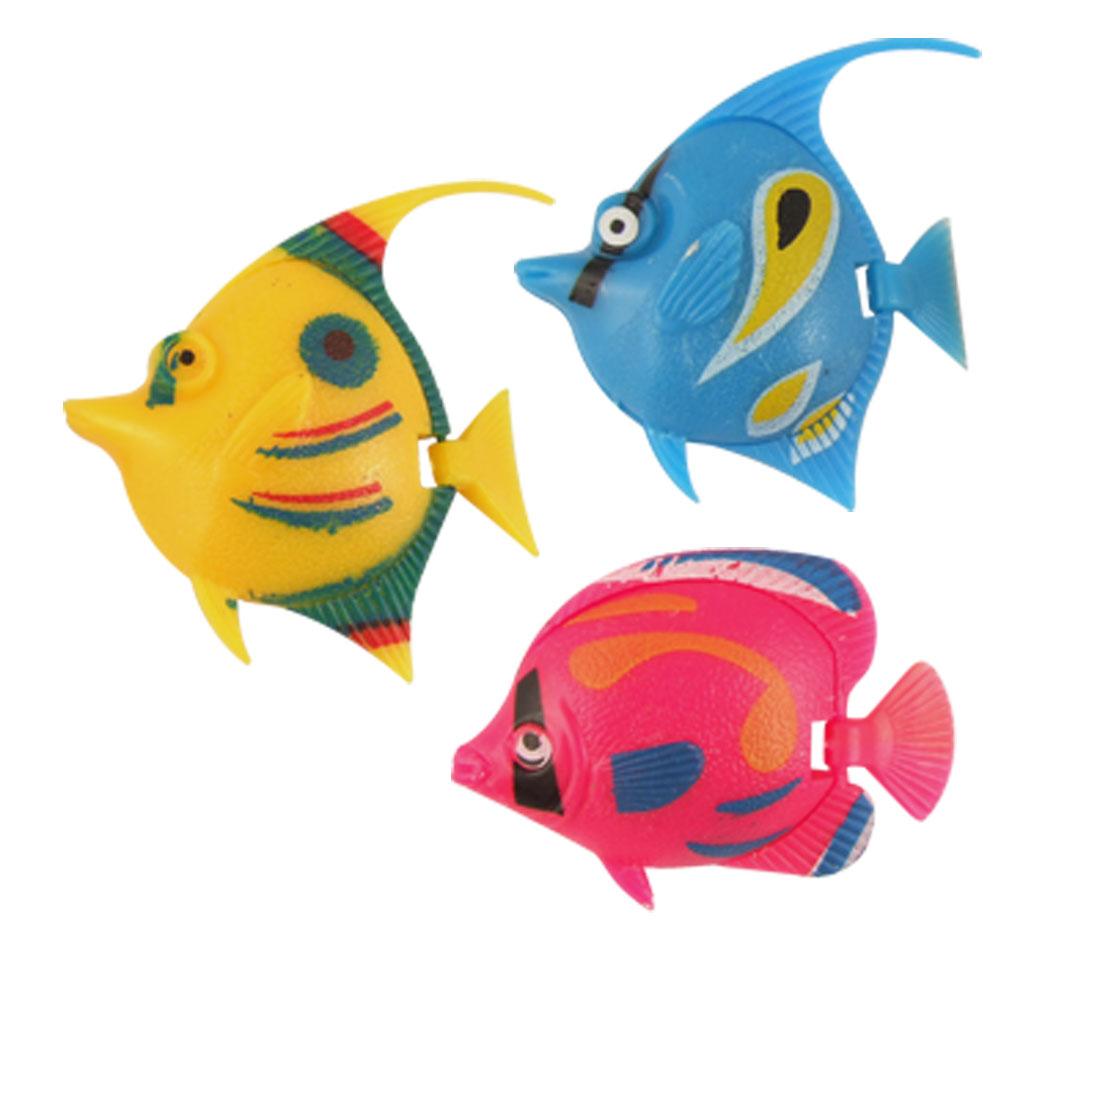 3 Pcs Colorful Plastic Wiggle Tail Fish for Aquarium